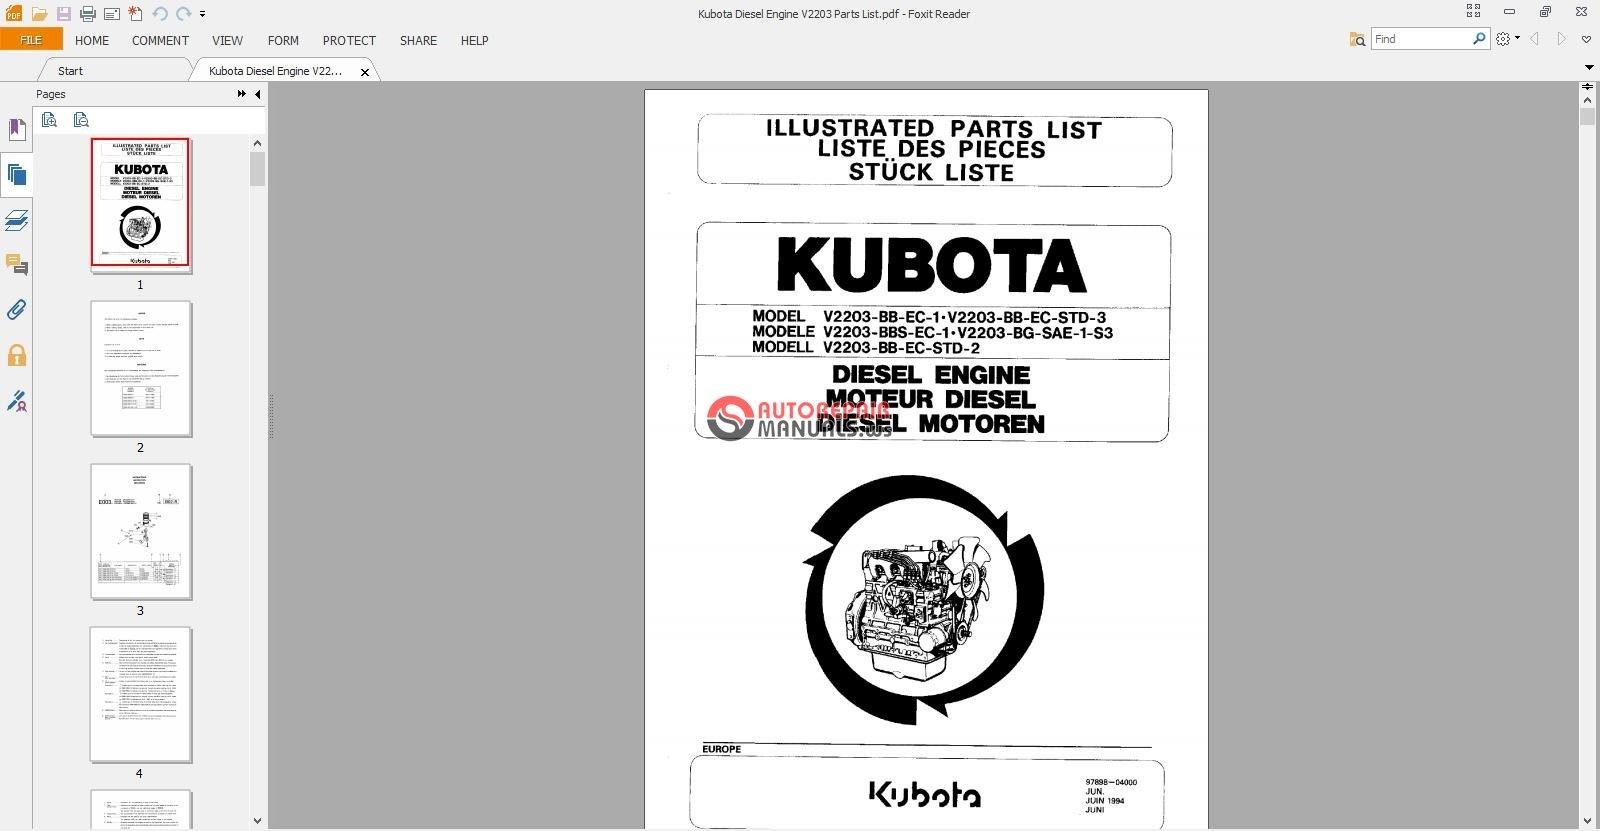 Kubota Diesel Engine V2203 Parts List.jpg